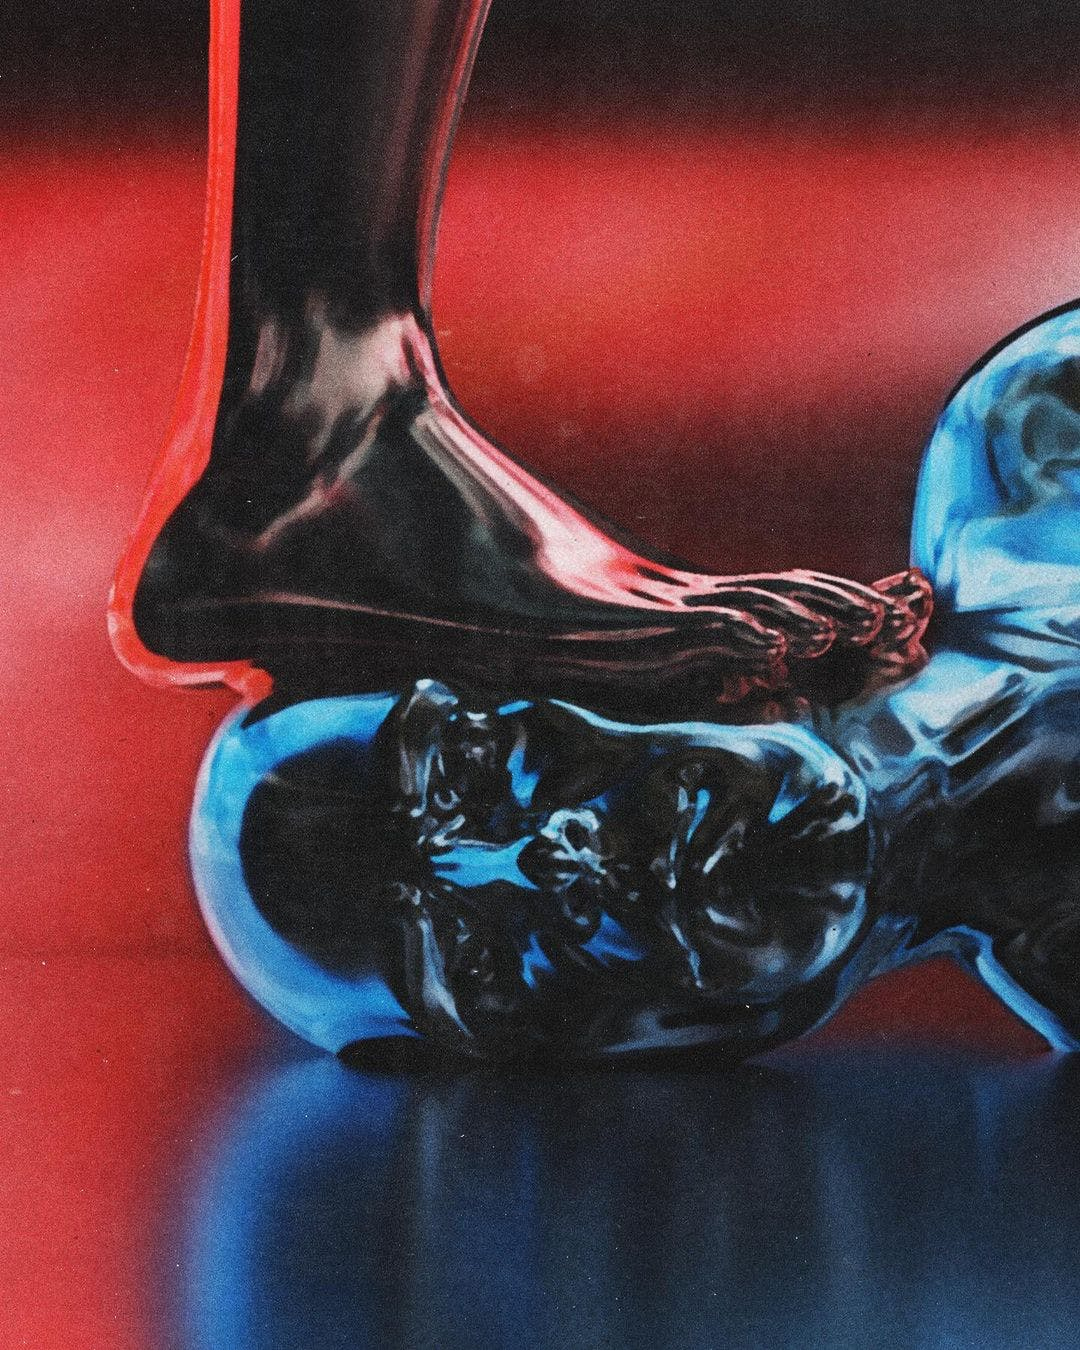 TUOMO KORHONEN: FEELING BLUE